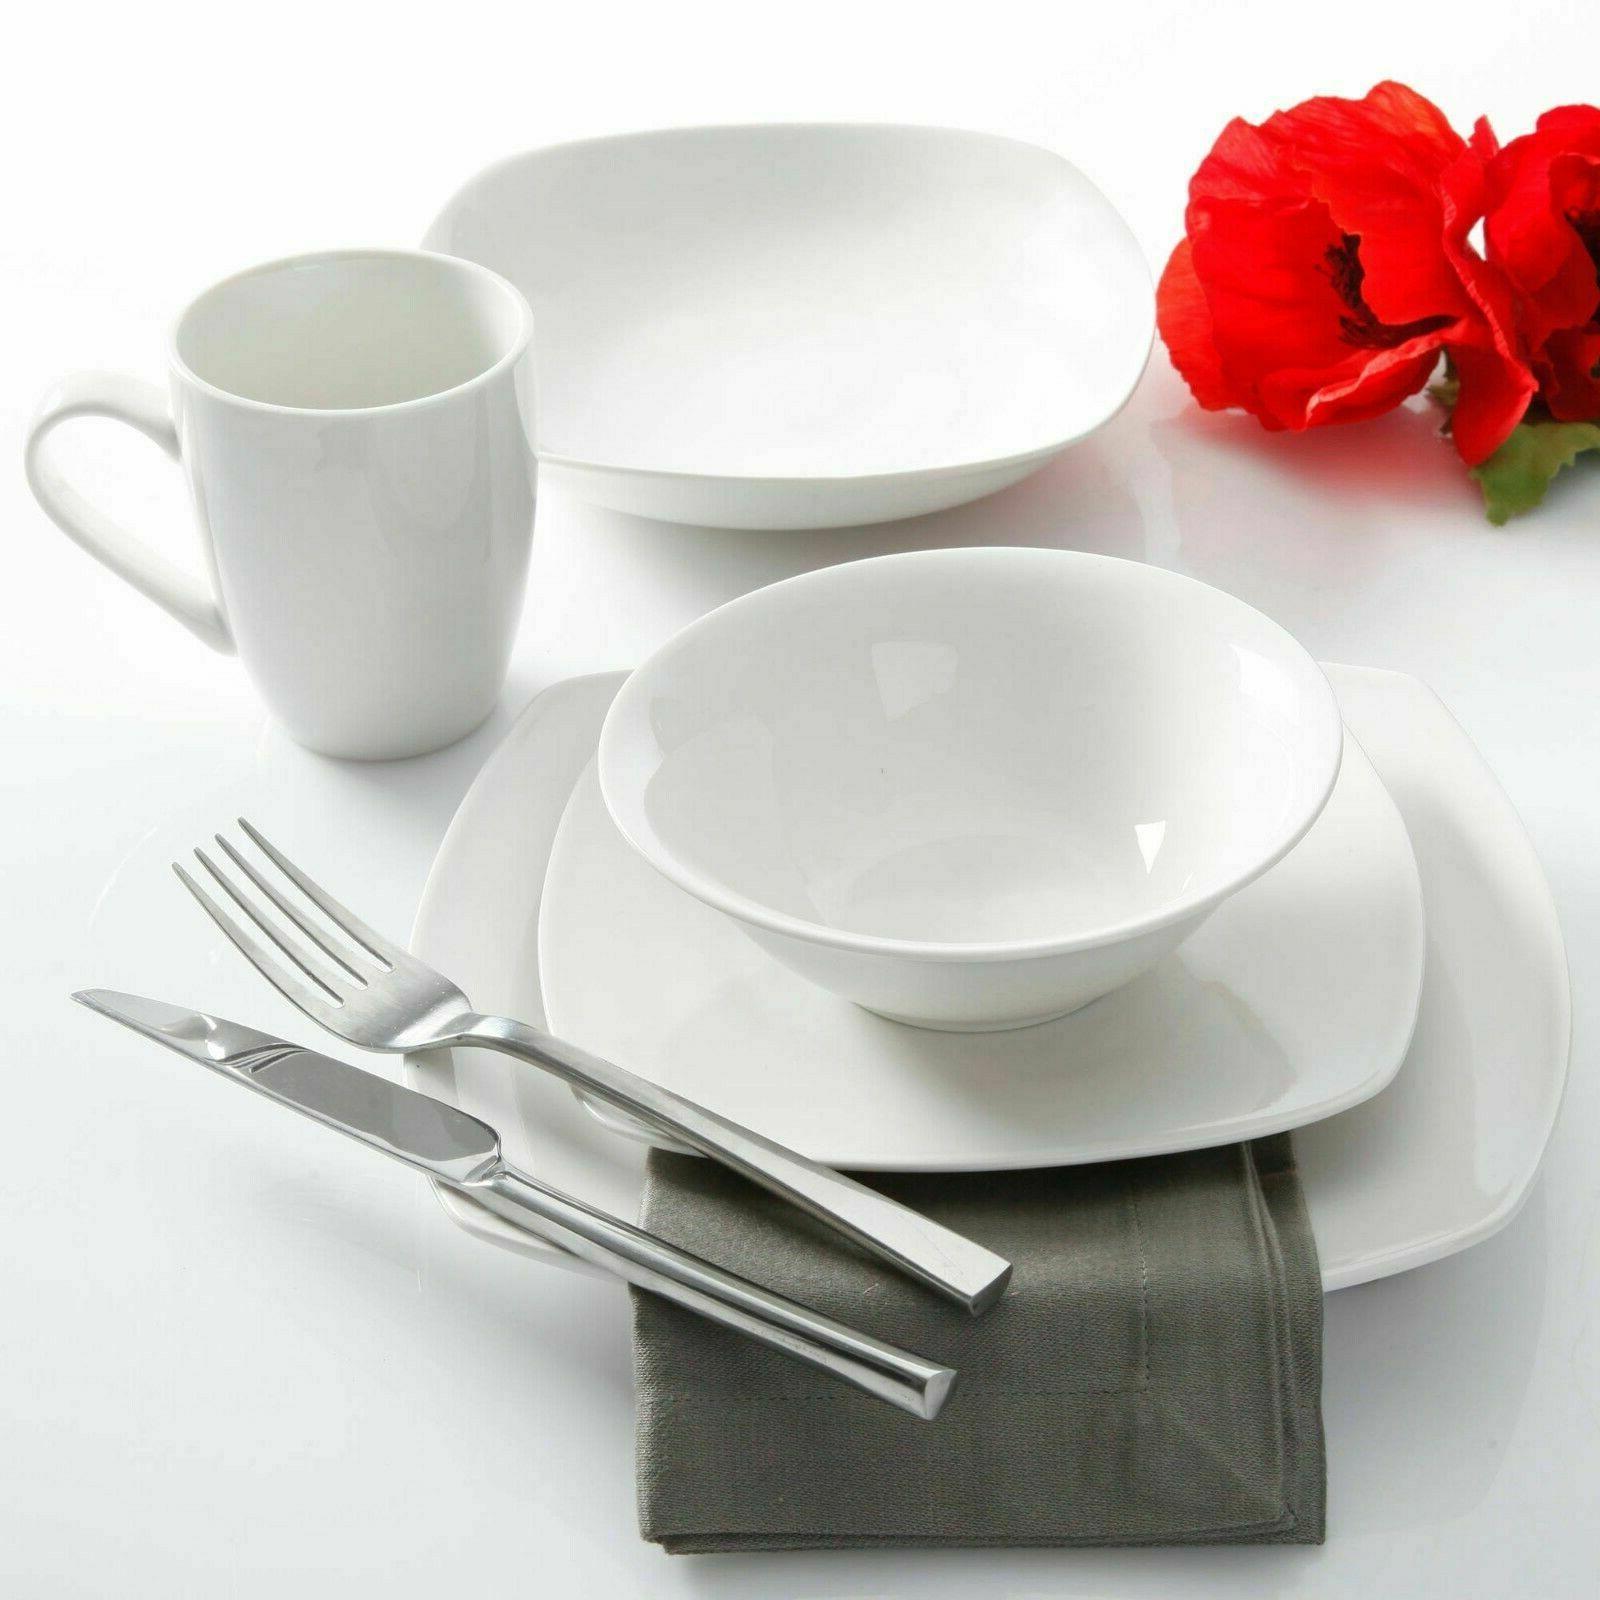 Porcelain Dinner Dish For 6 30-Piece